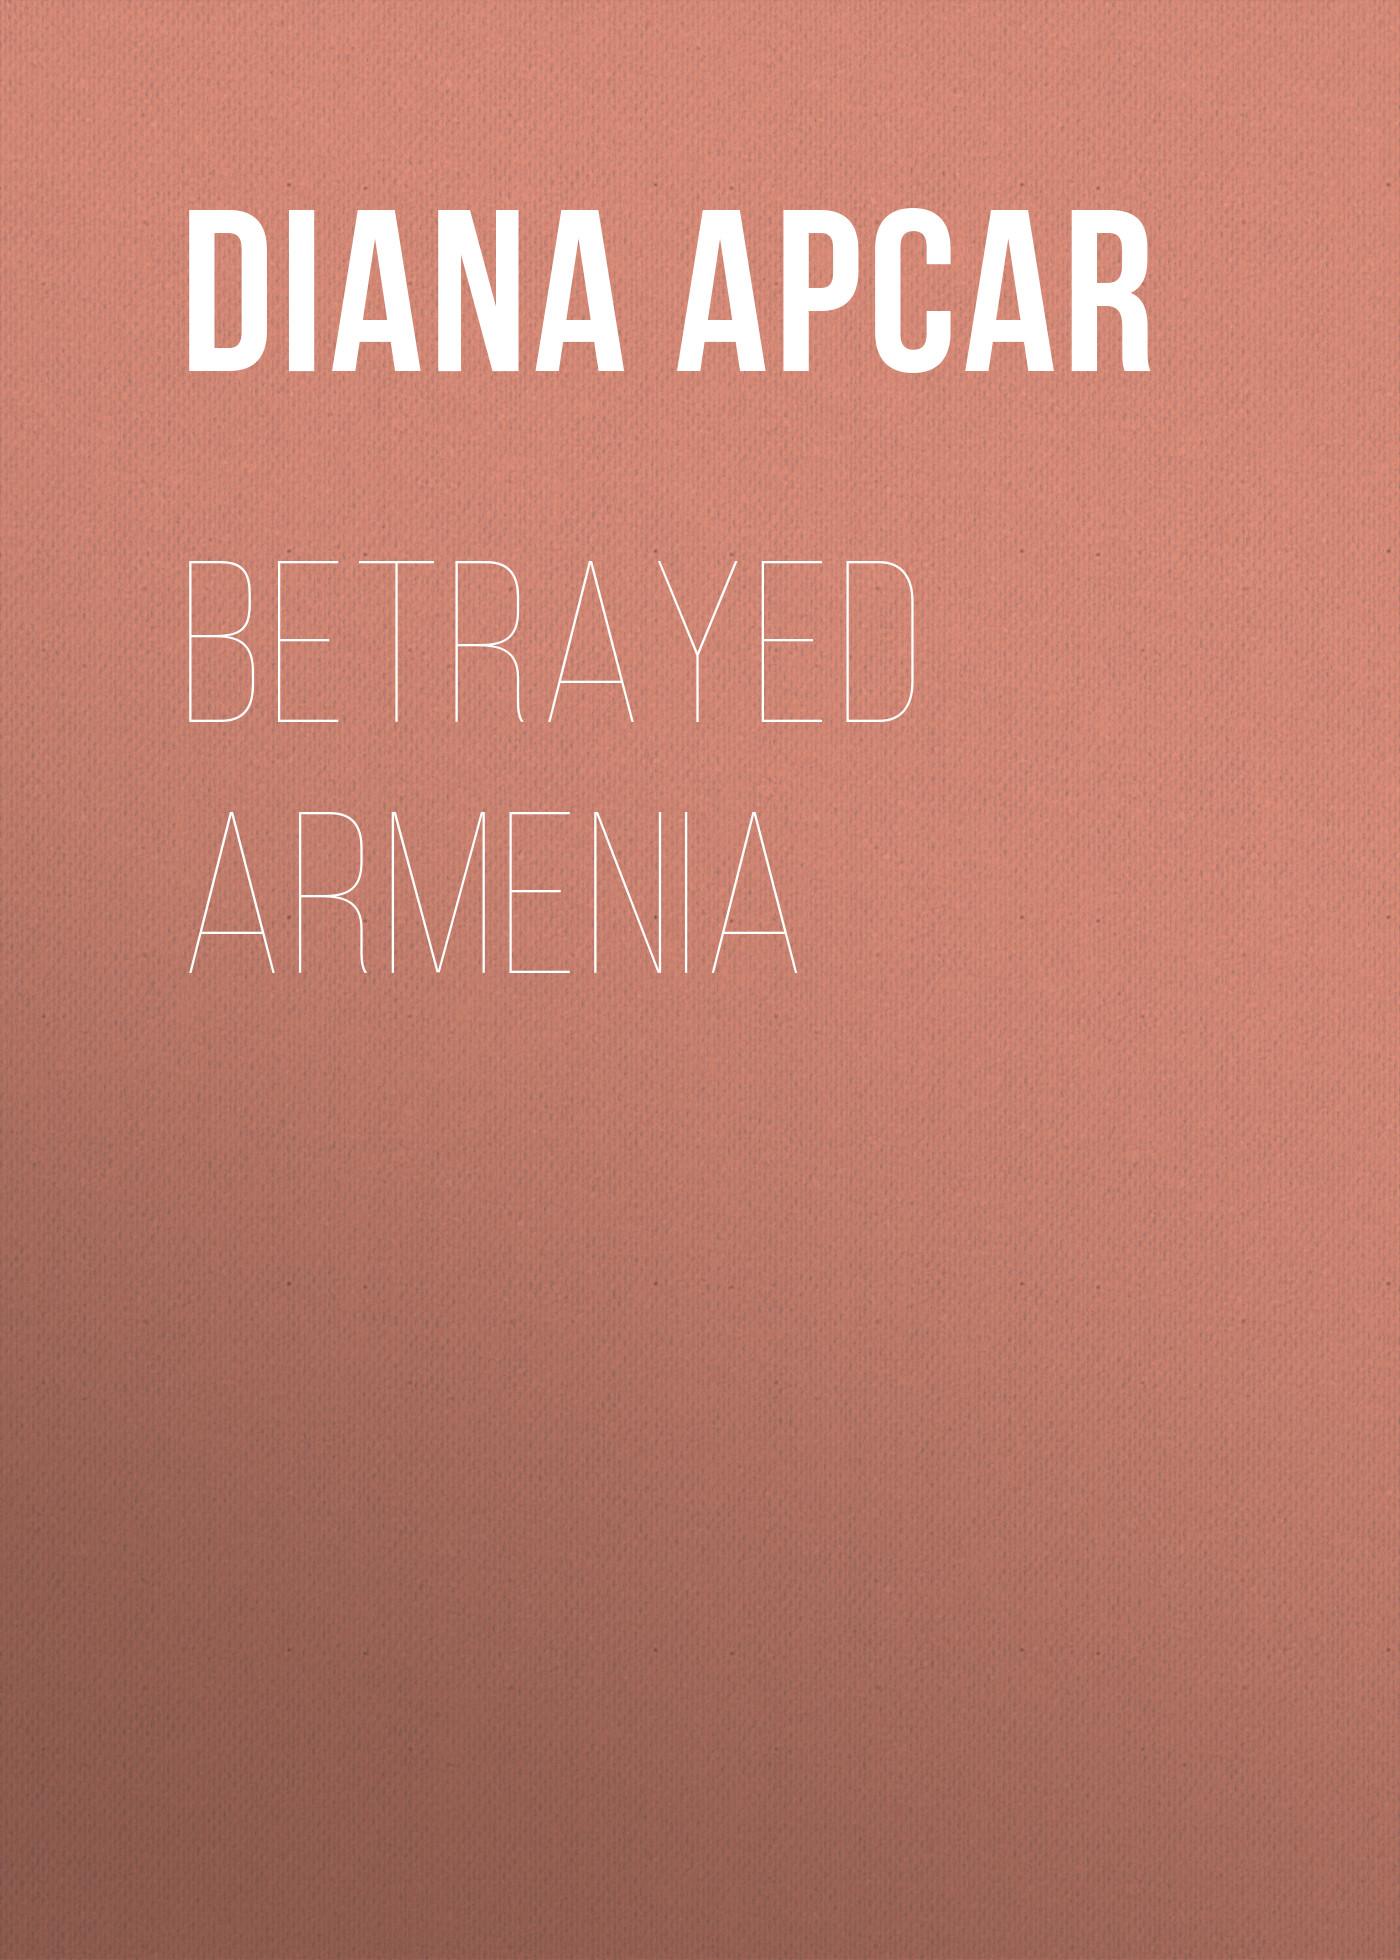 Apcar Diana Agabeg Betrayed Armenia betrayed not broken